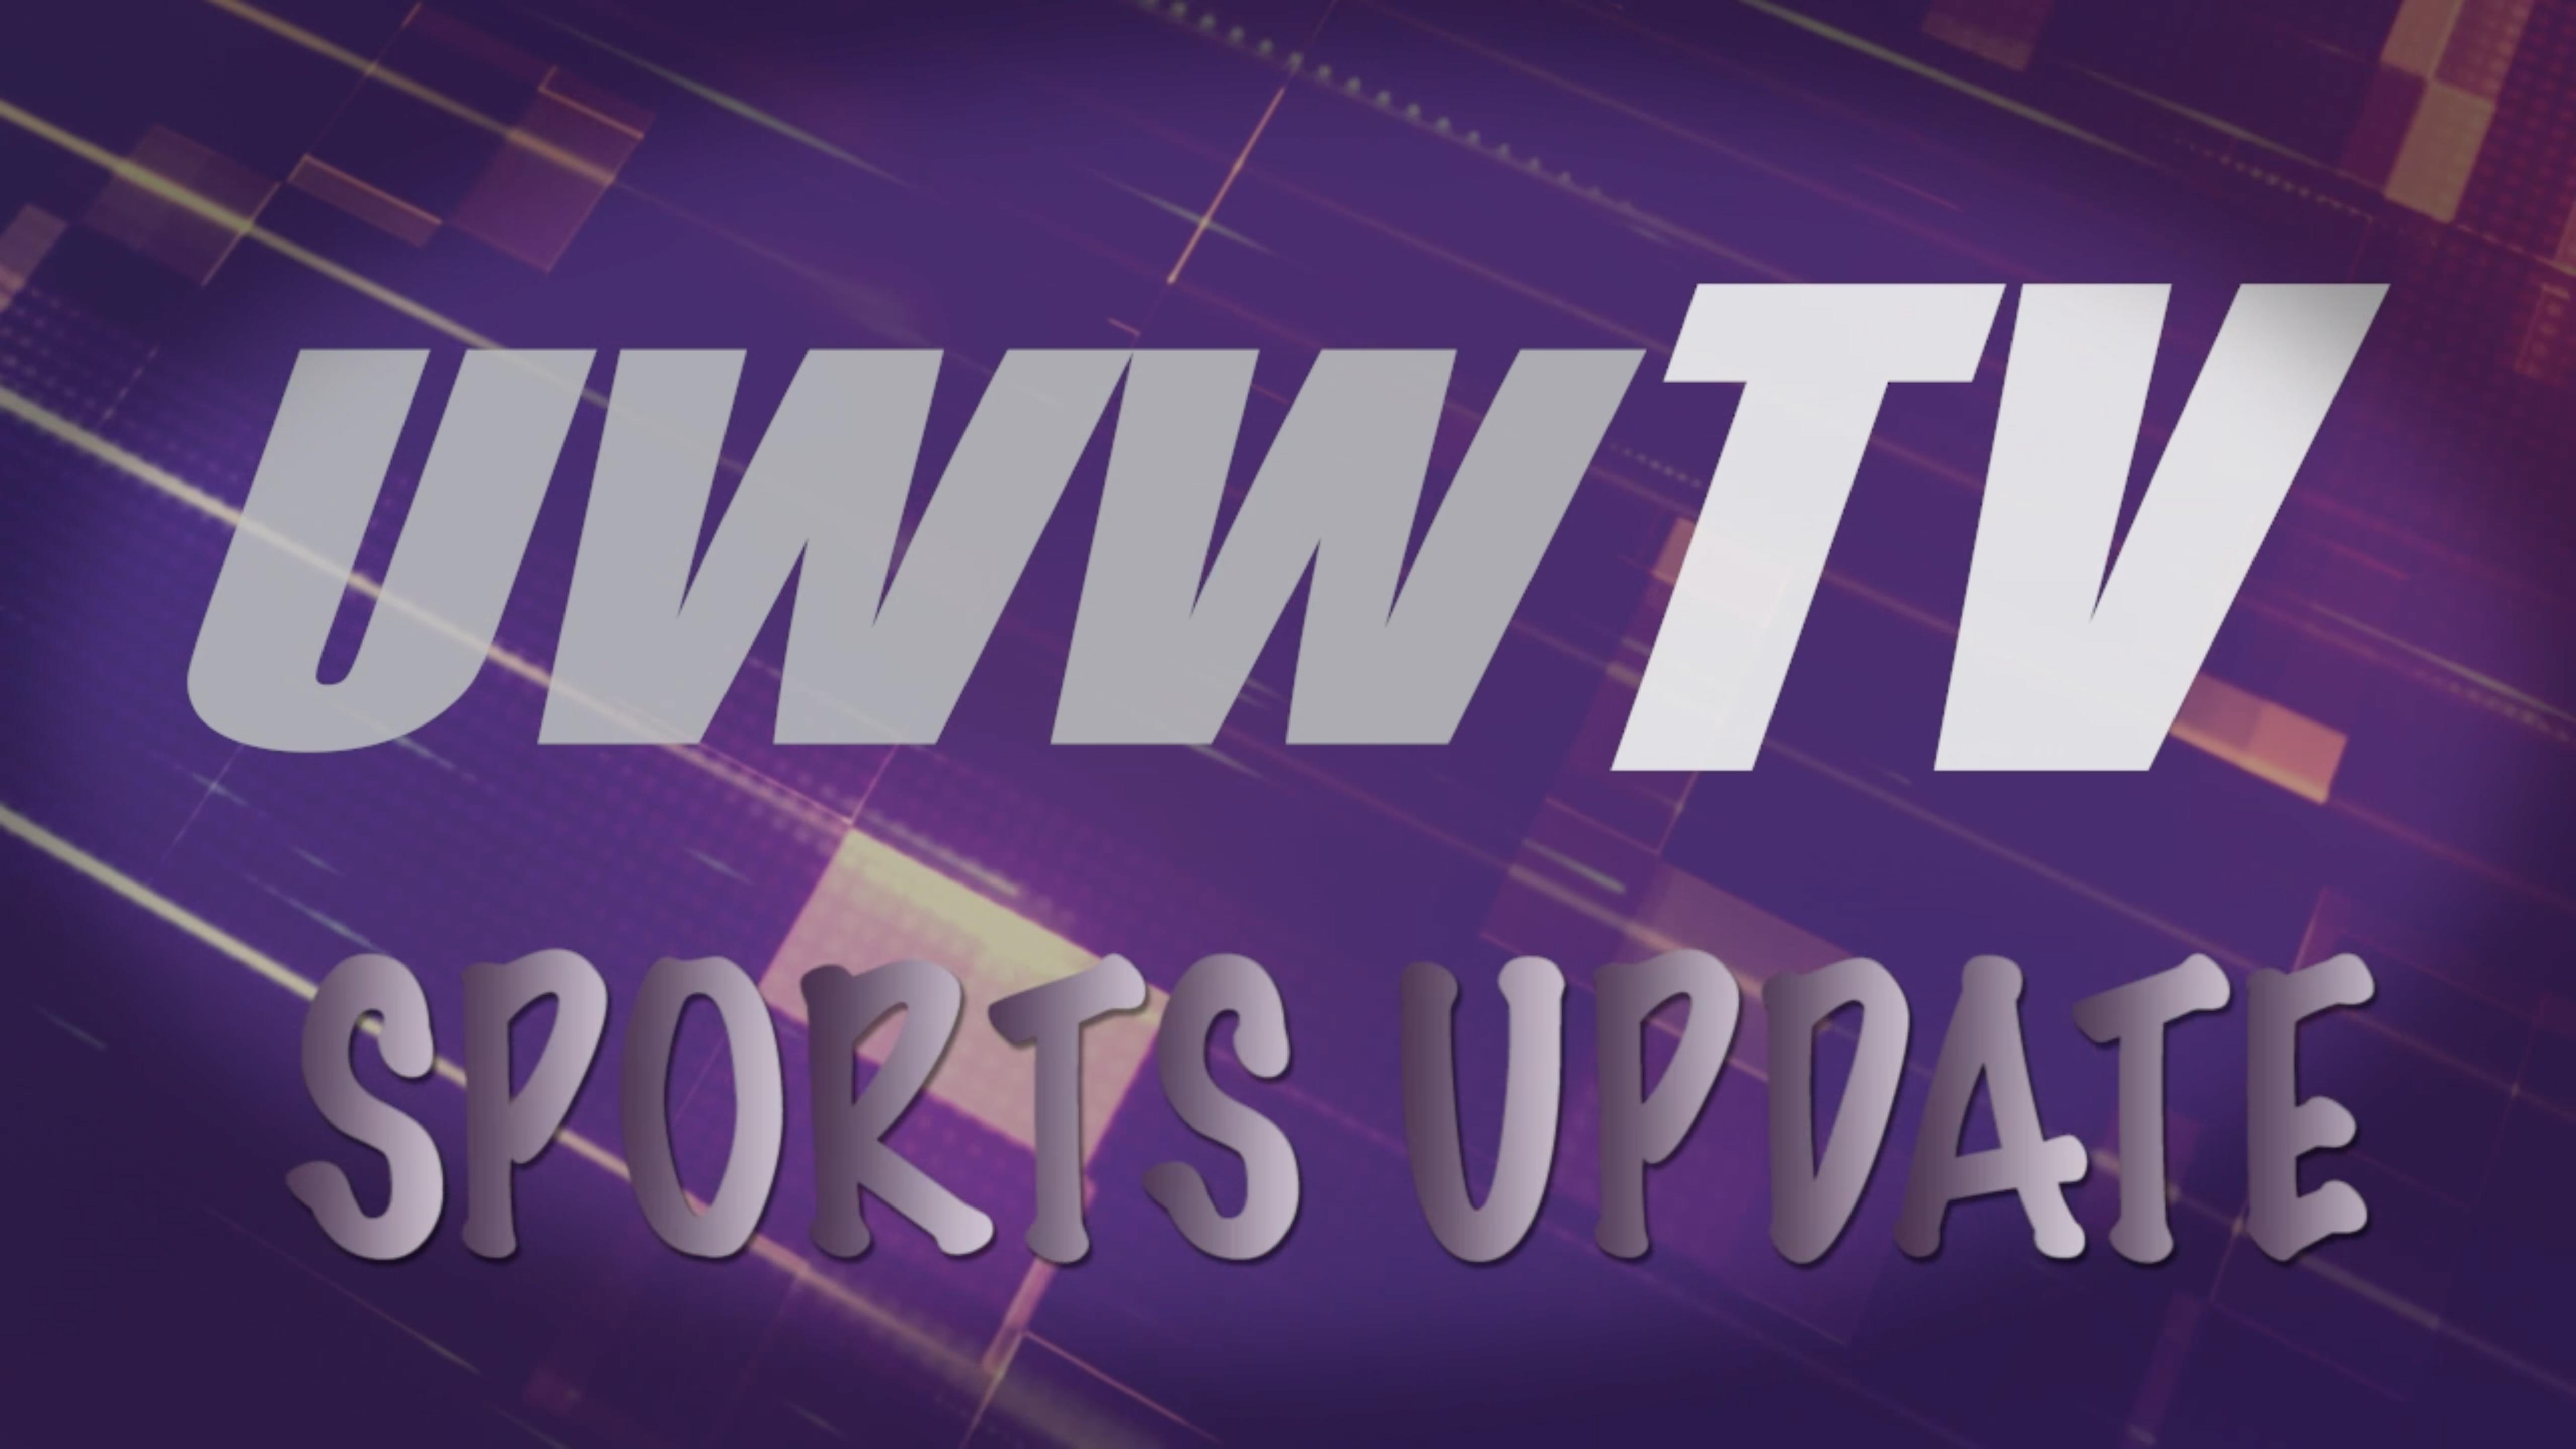 UWW-TV Sports Update: October 14th, 2021